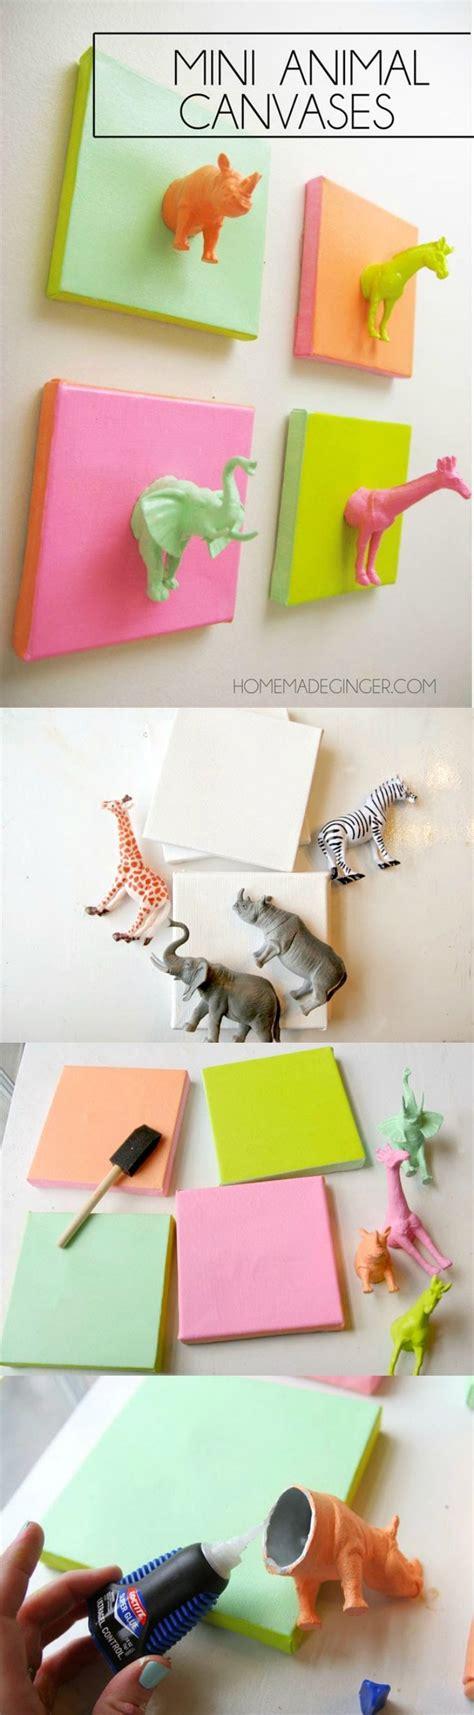 lilbrownhouse diy and crafts mini plastic animals diy canvas craft studios diy